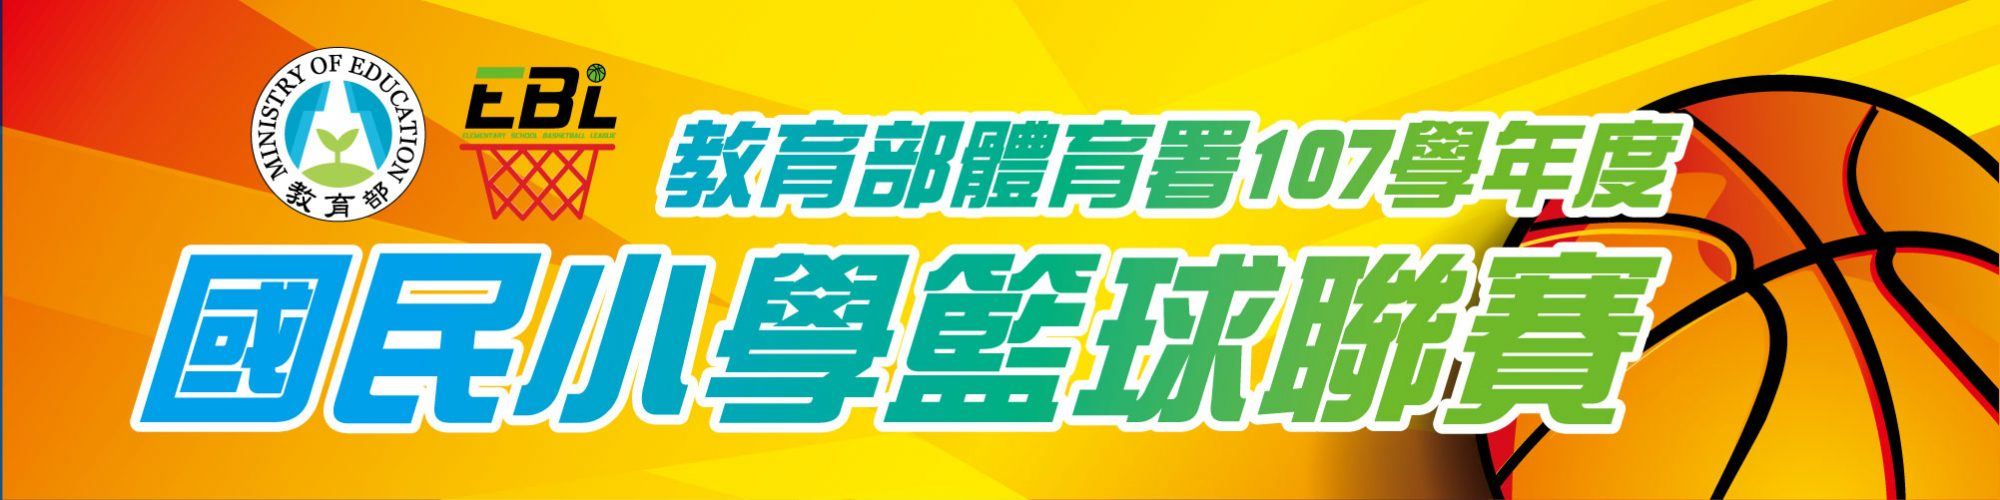 banner-new20181211